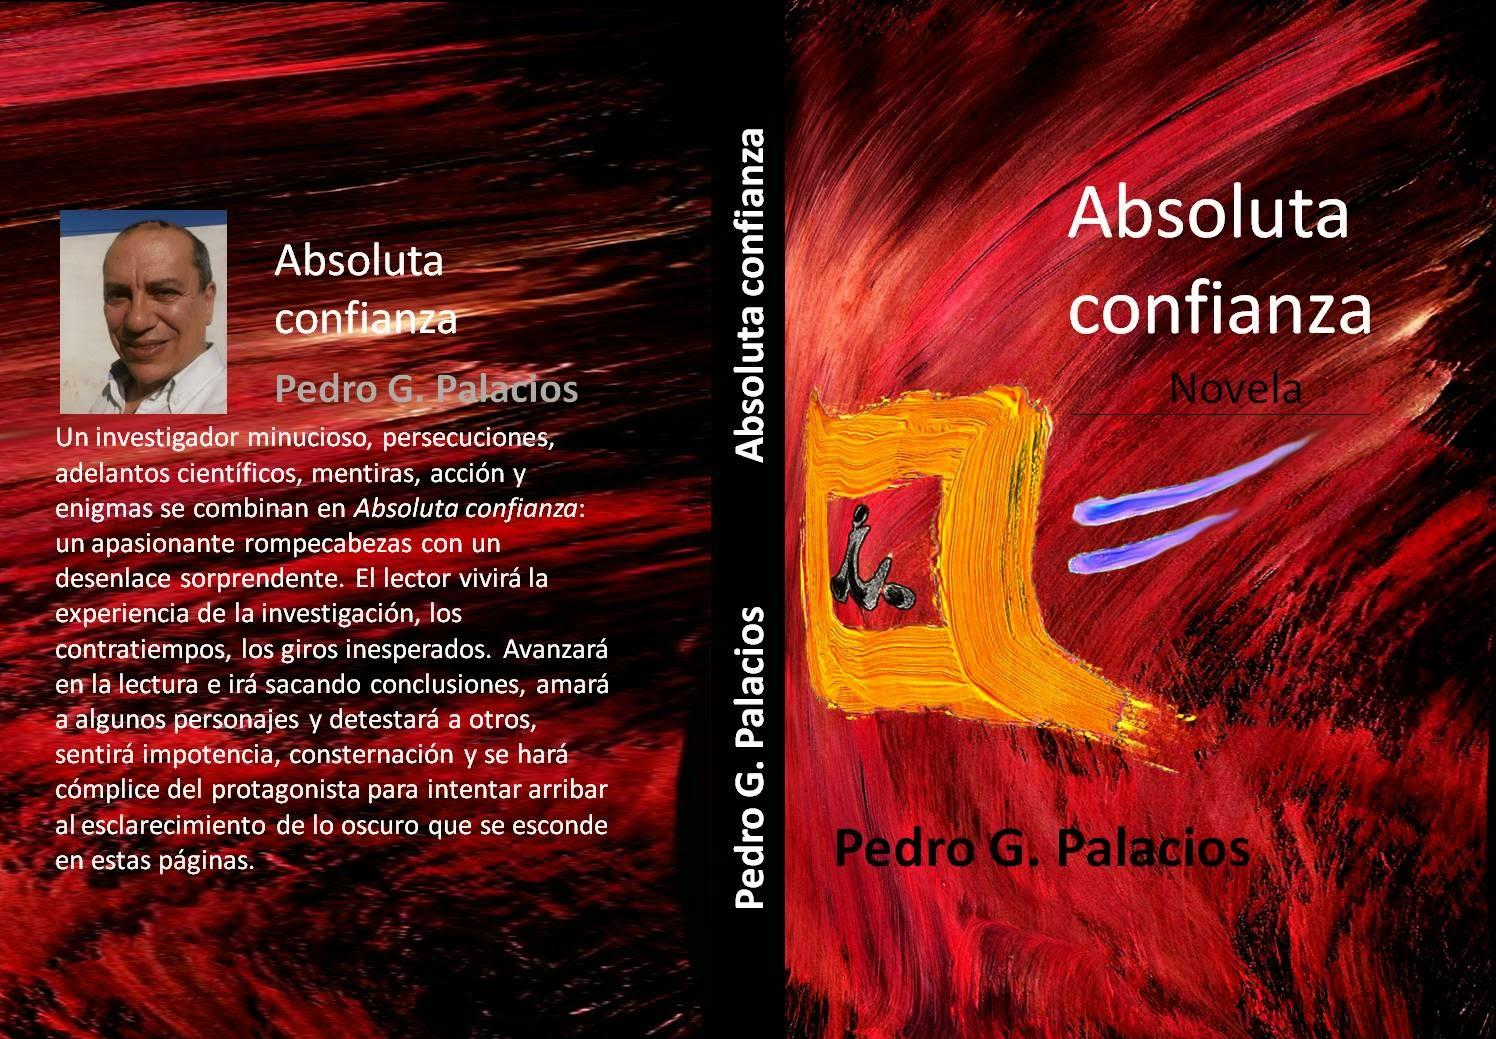 Absoluta confianza - Bajar novela.